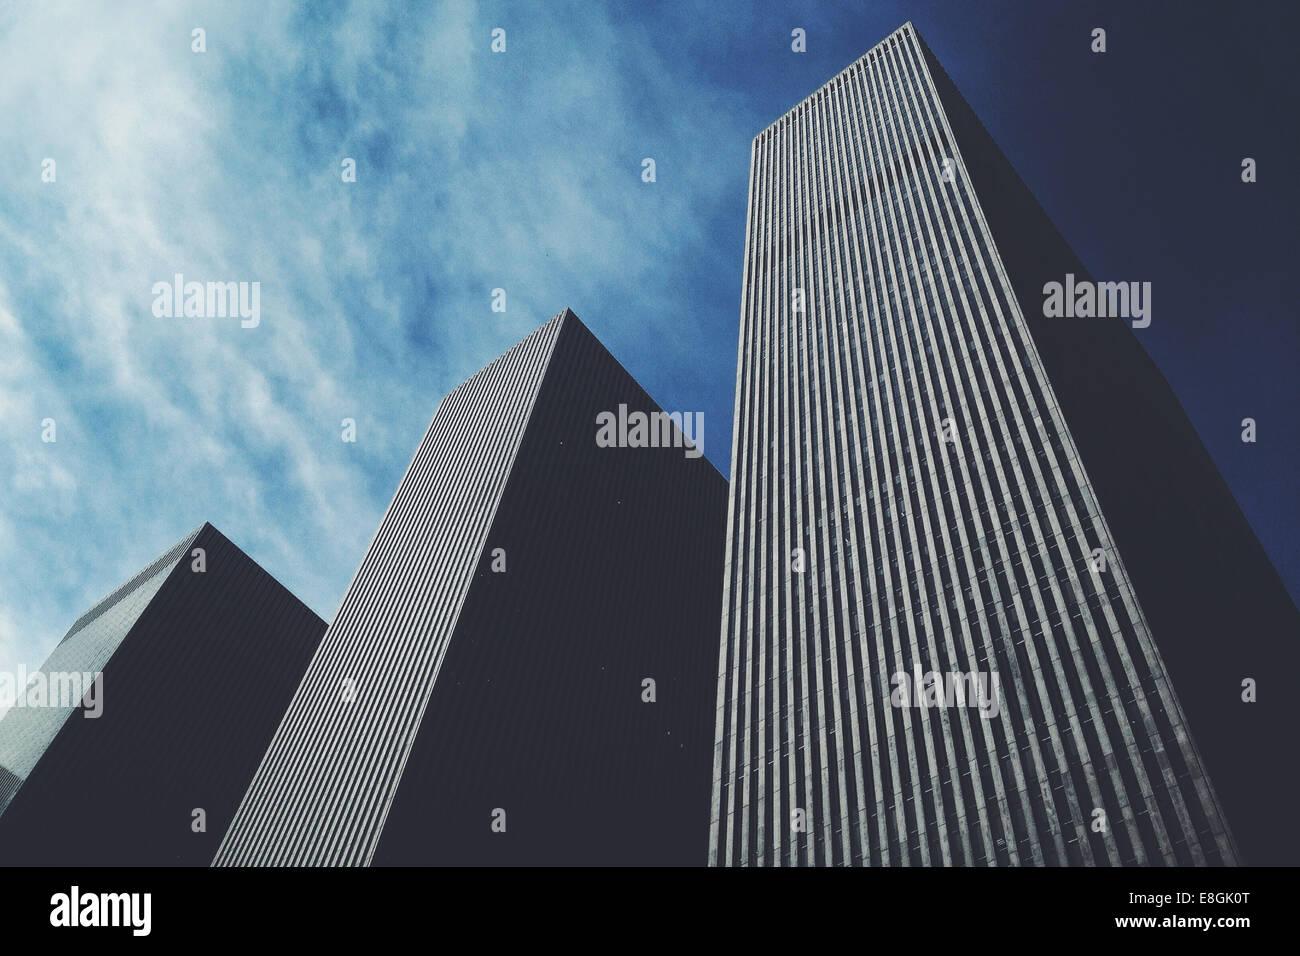 USA, New York City, Manhattan, Skyscrapers - Stock Image